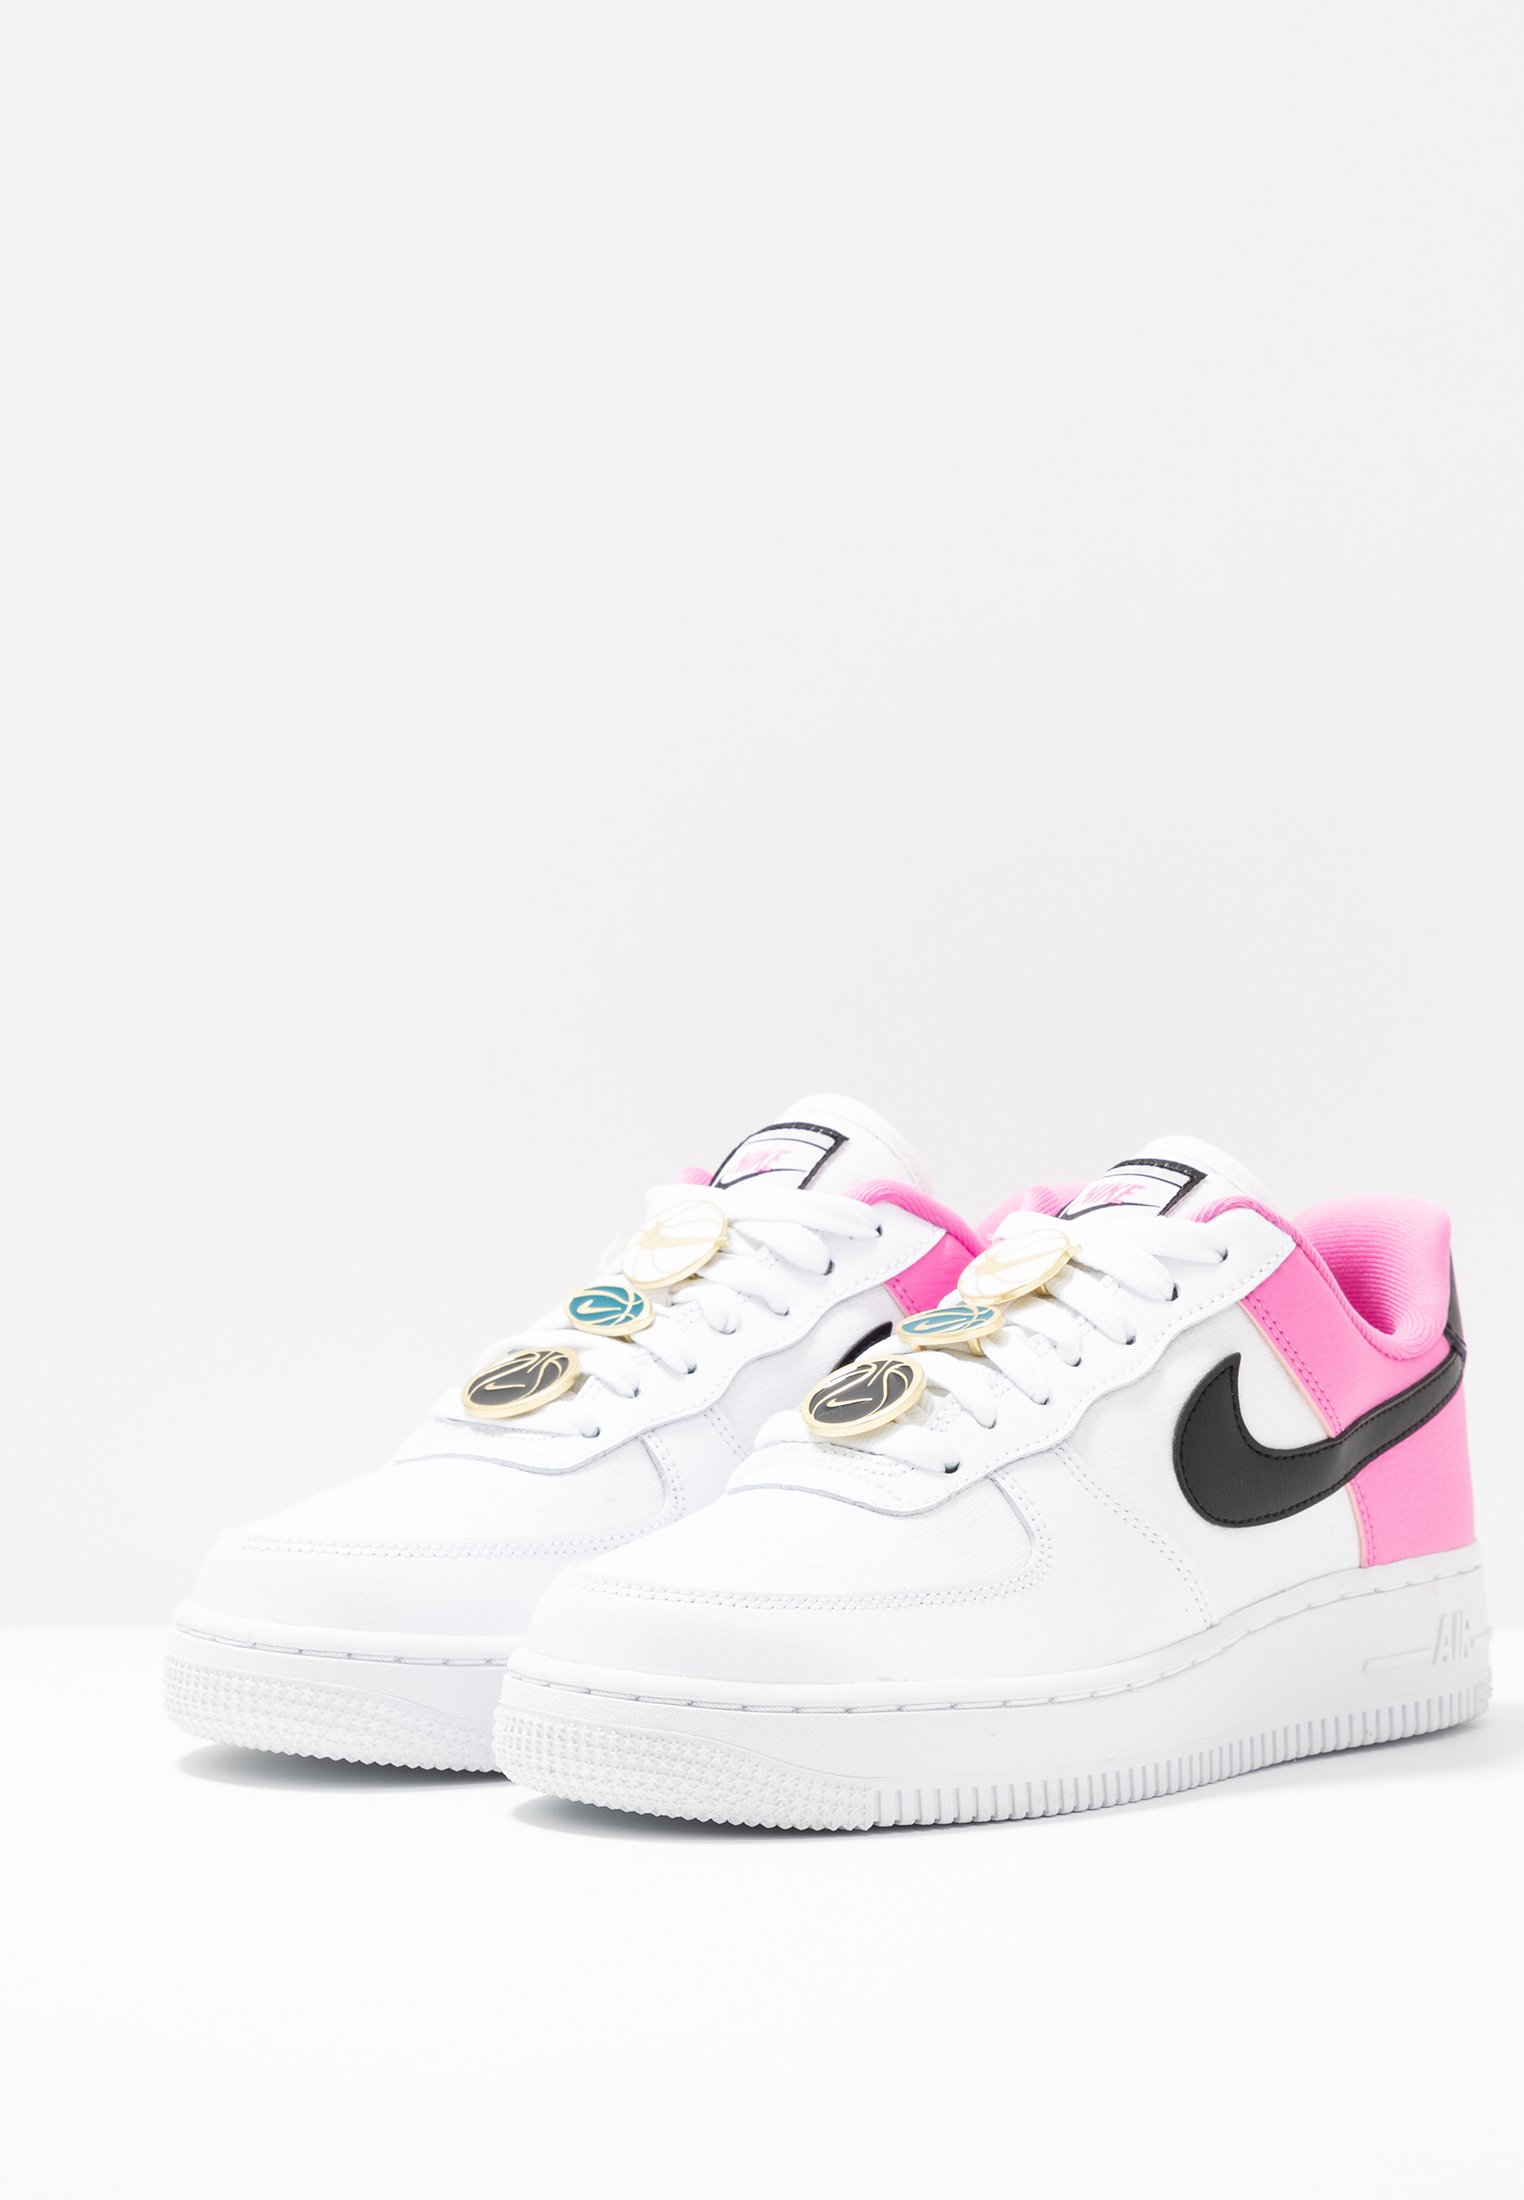 air force 1 bianche e rosa